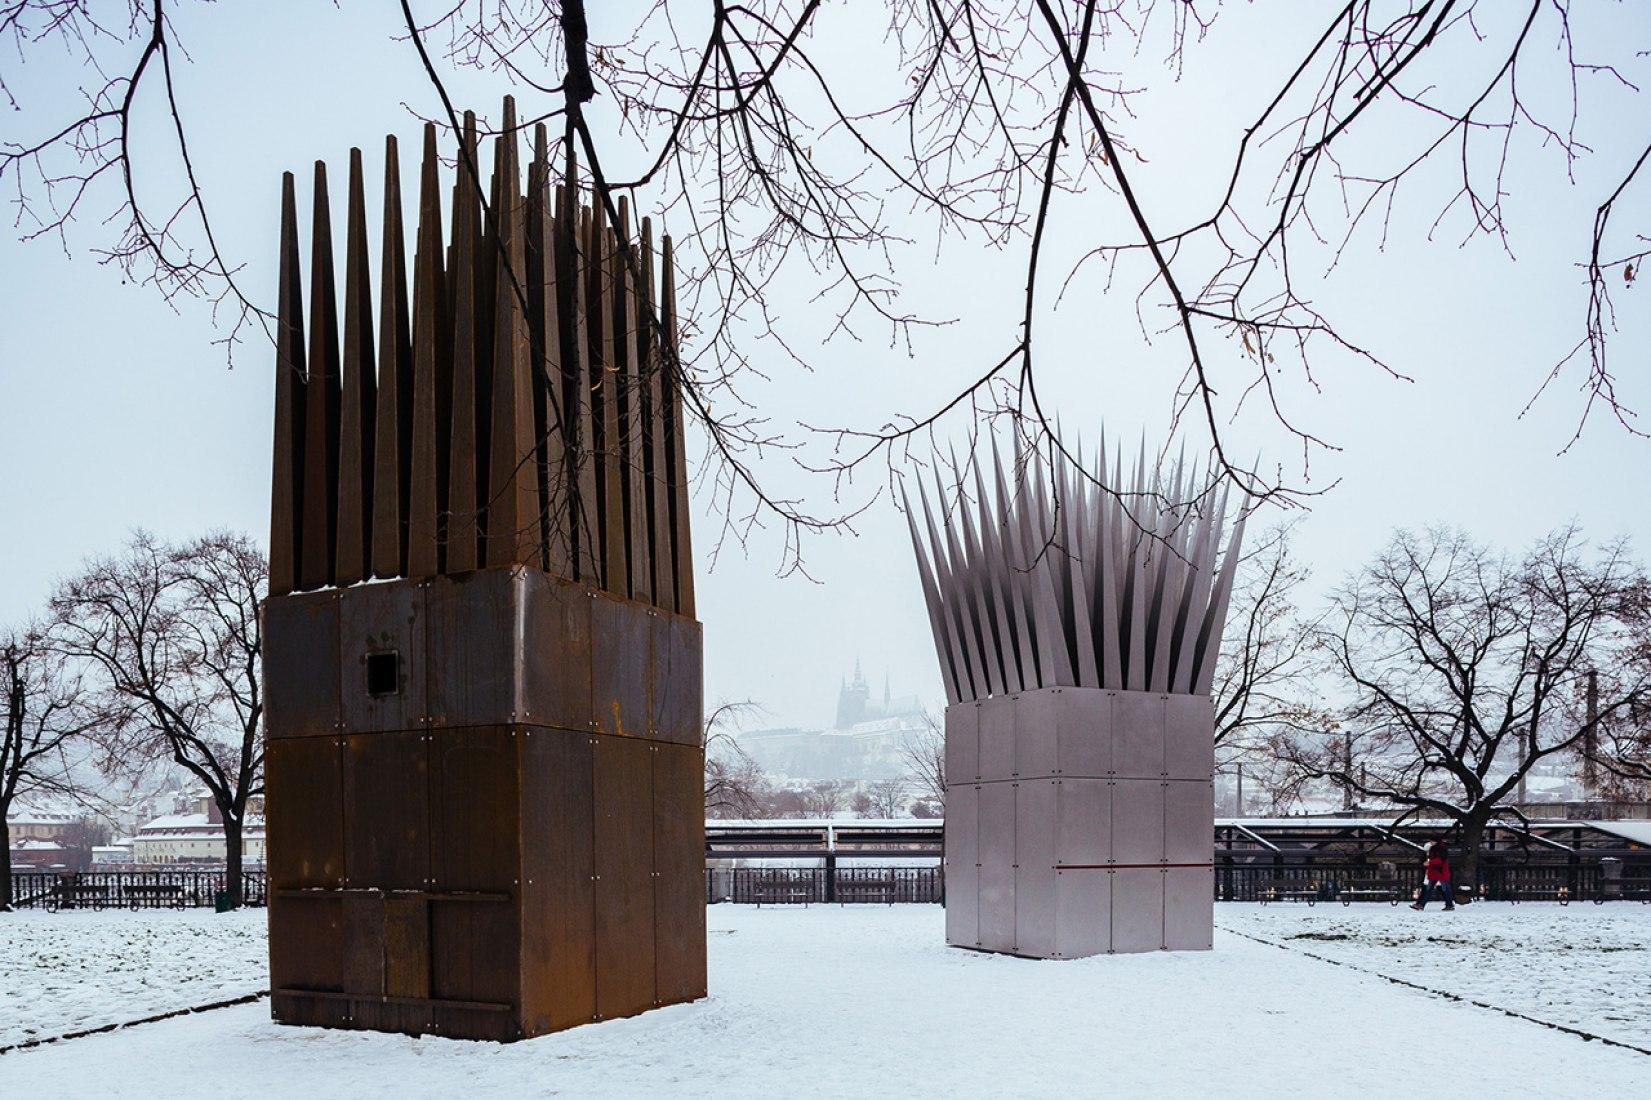 Memorial a Jan Palach, diseñado por John Hejduk. Fotografía © Miroslav Cikán.